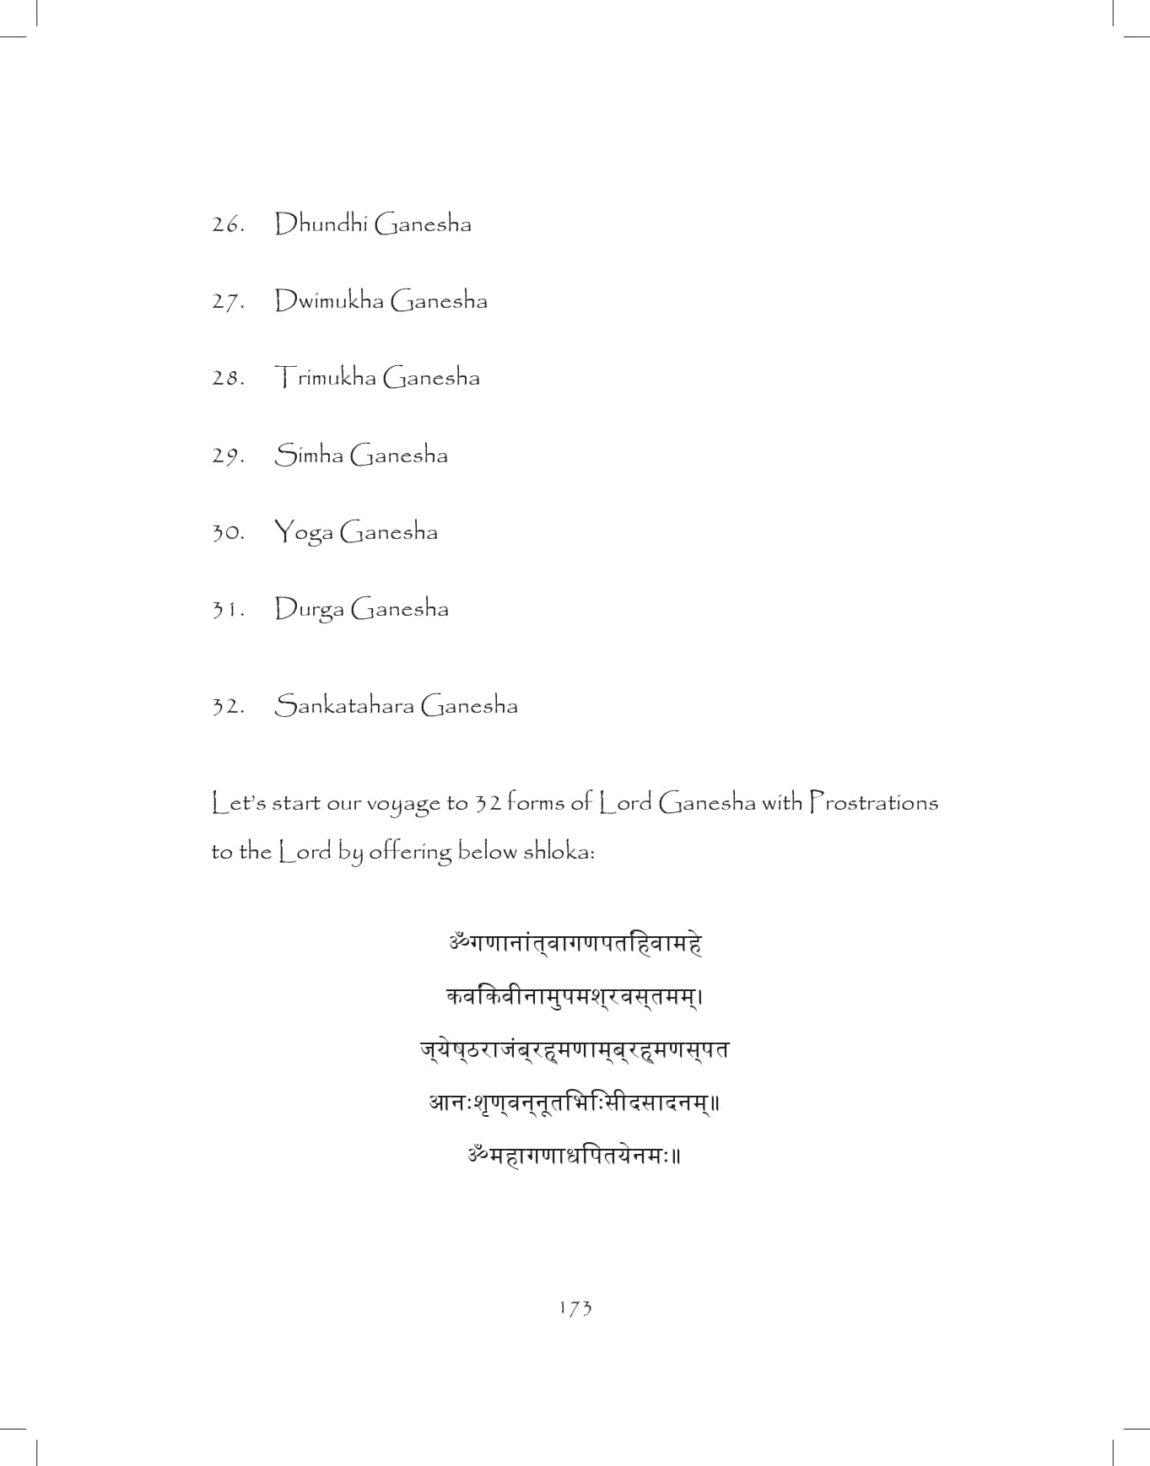 Ganesh-print_pages-to-jpg-0173.jpg